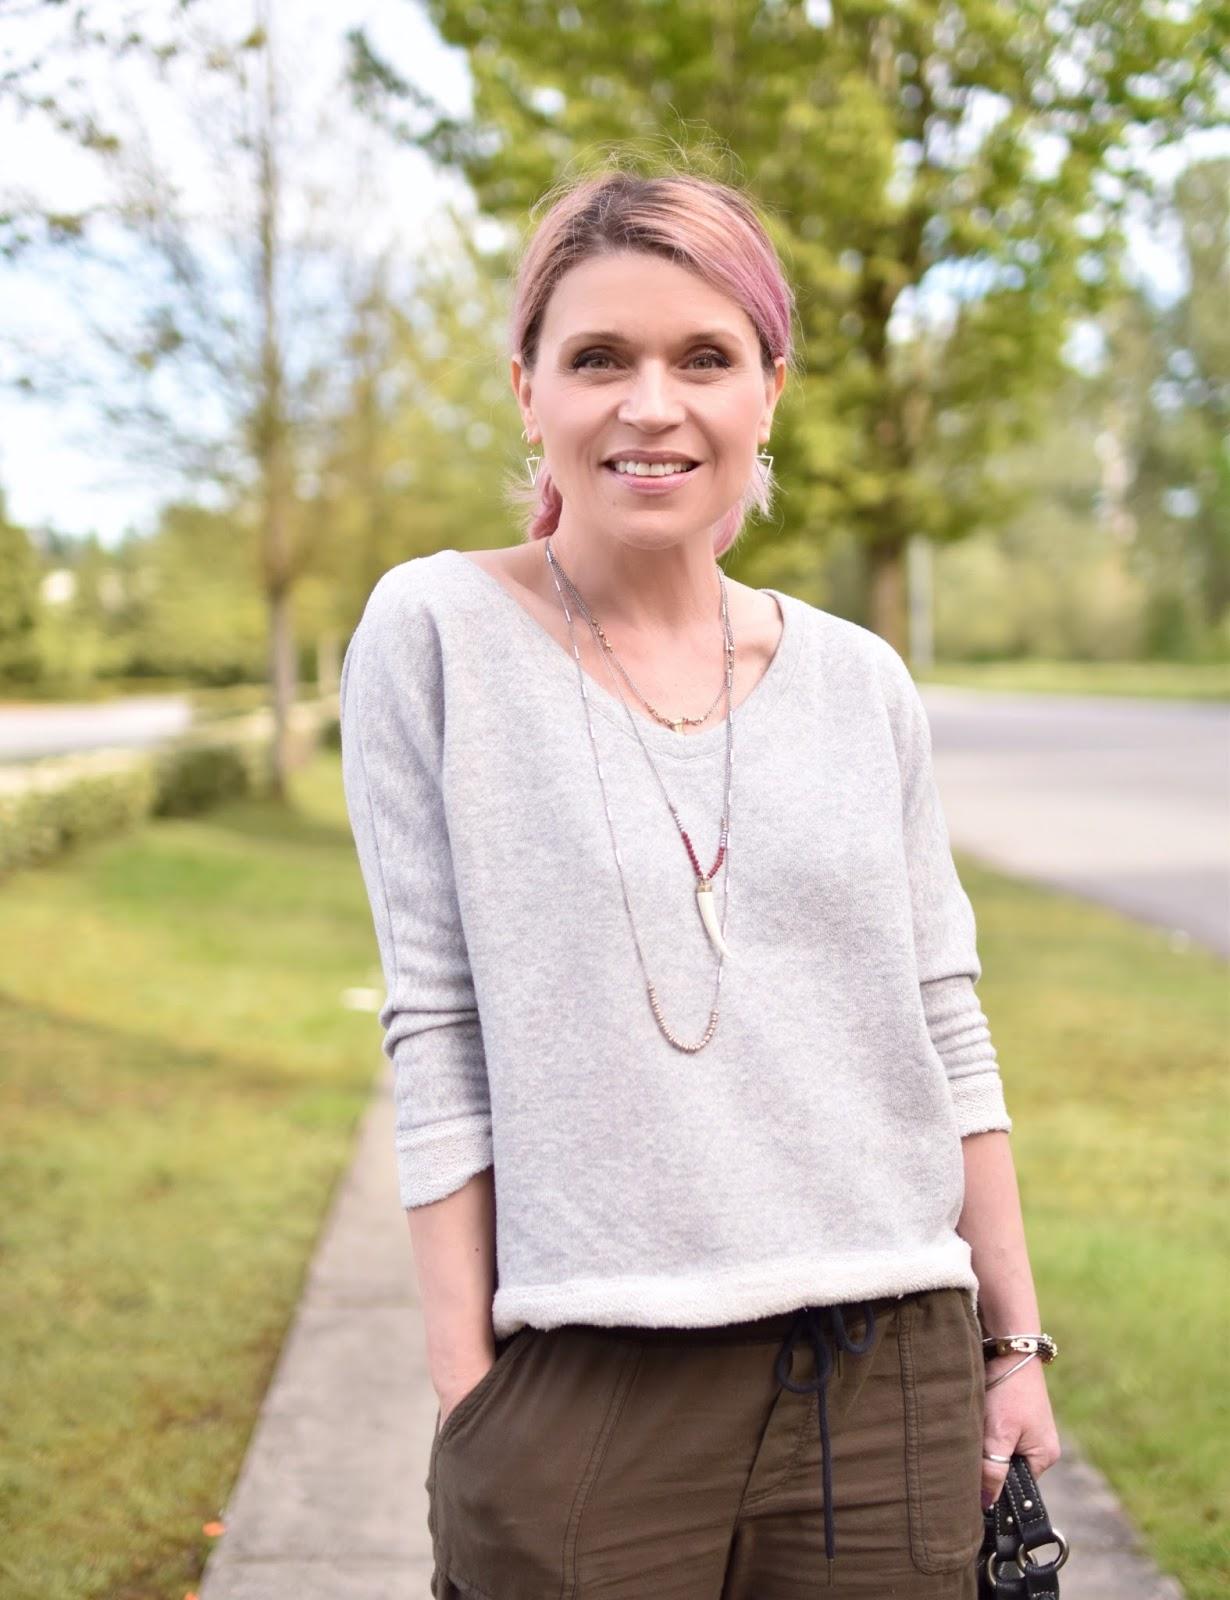 Monika Faulkner outfit inspiration - slouchy cargo pants, v-neck sweatshirt